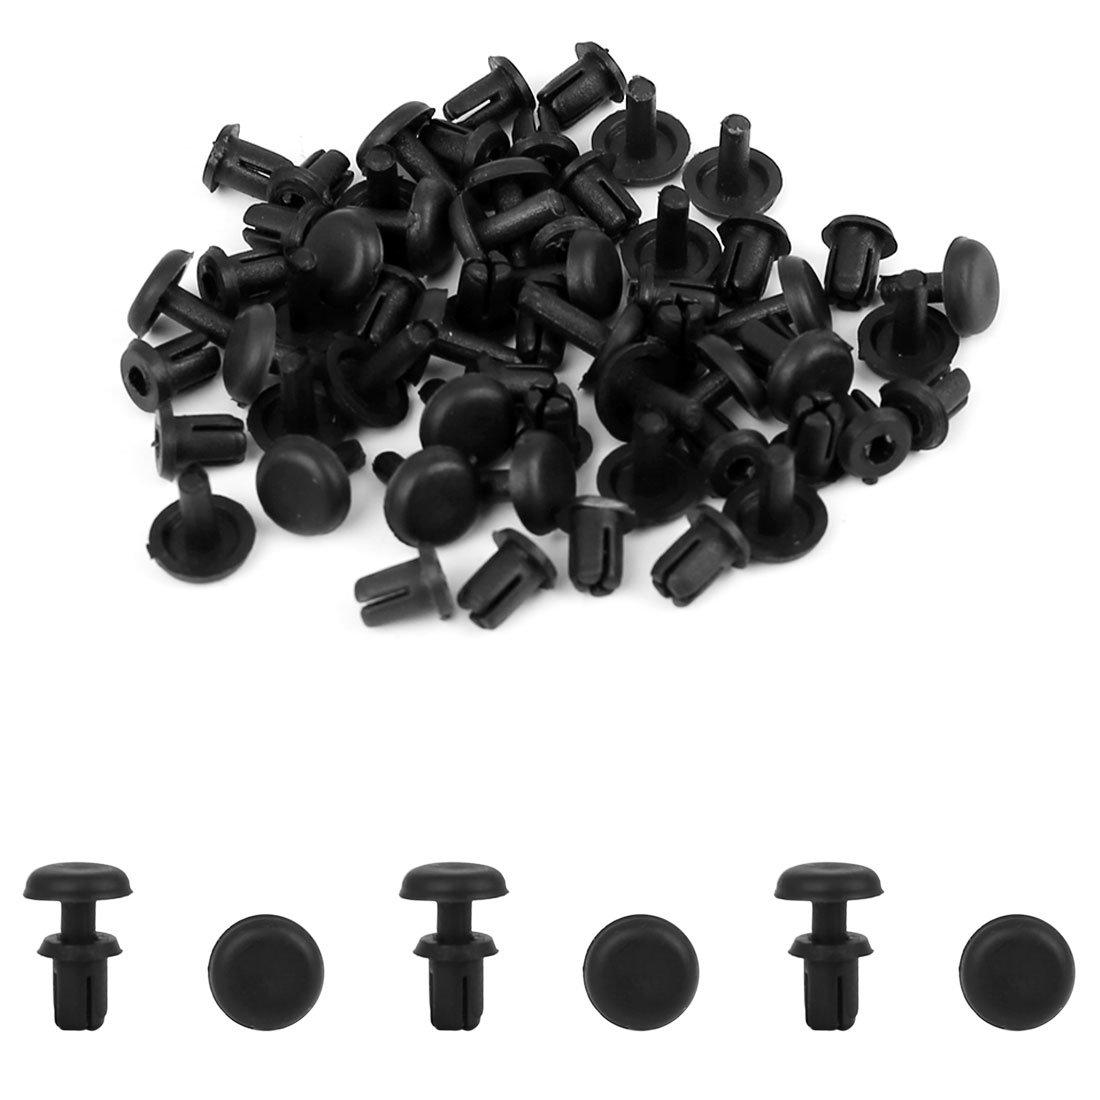 Sourcingmap 30Pcs 4mm Black Plastic Rivets Push Type Panel Retainer Fastener Clip for Car